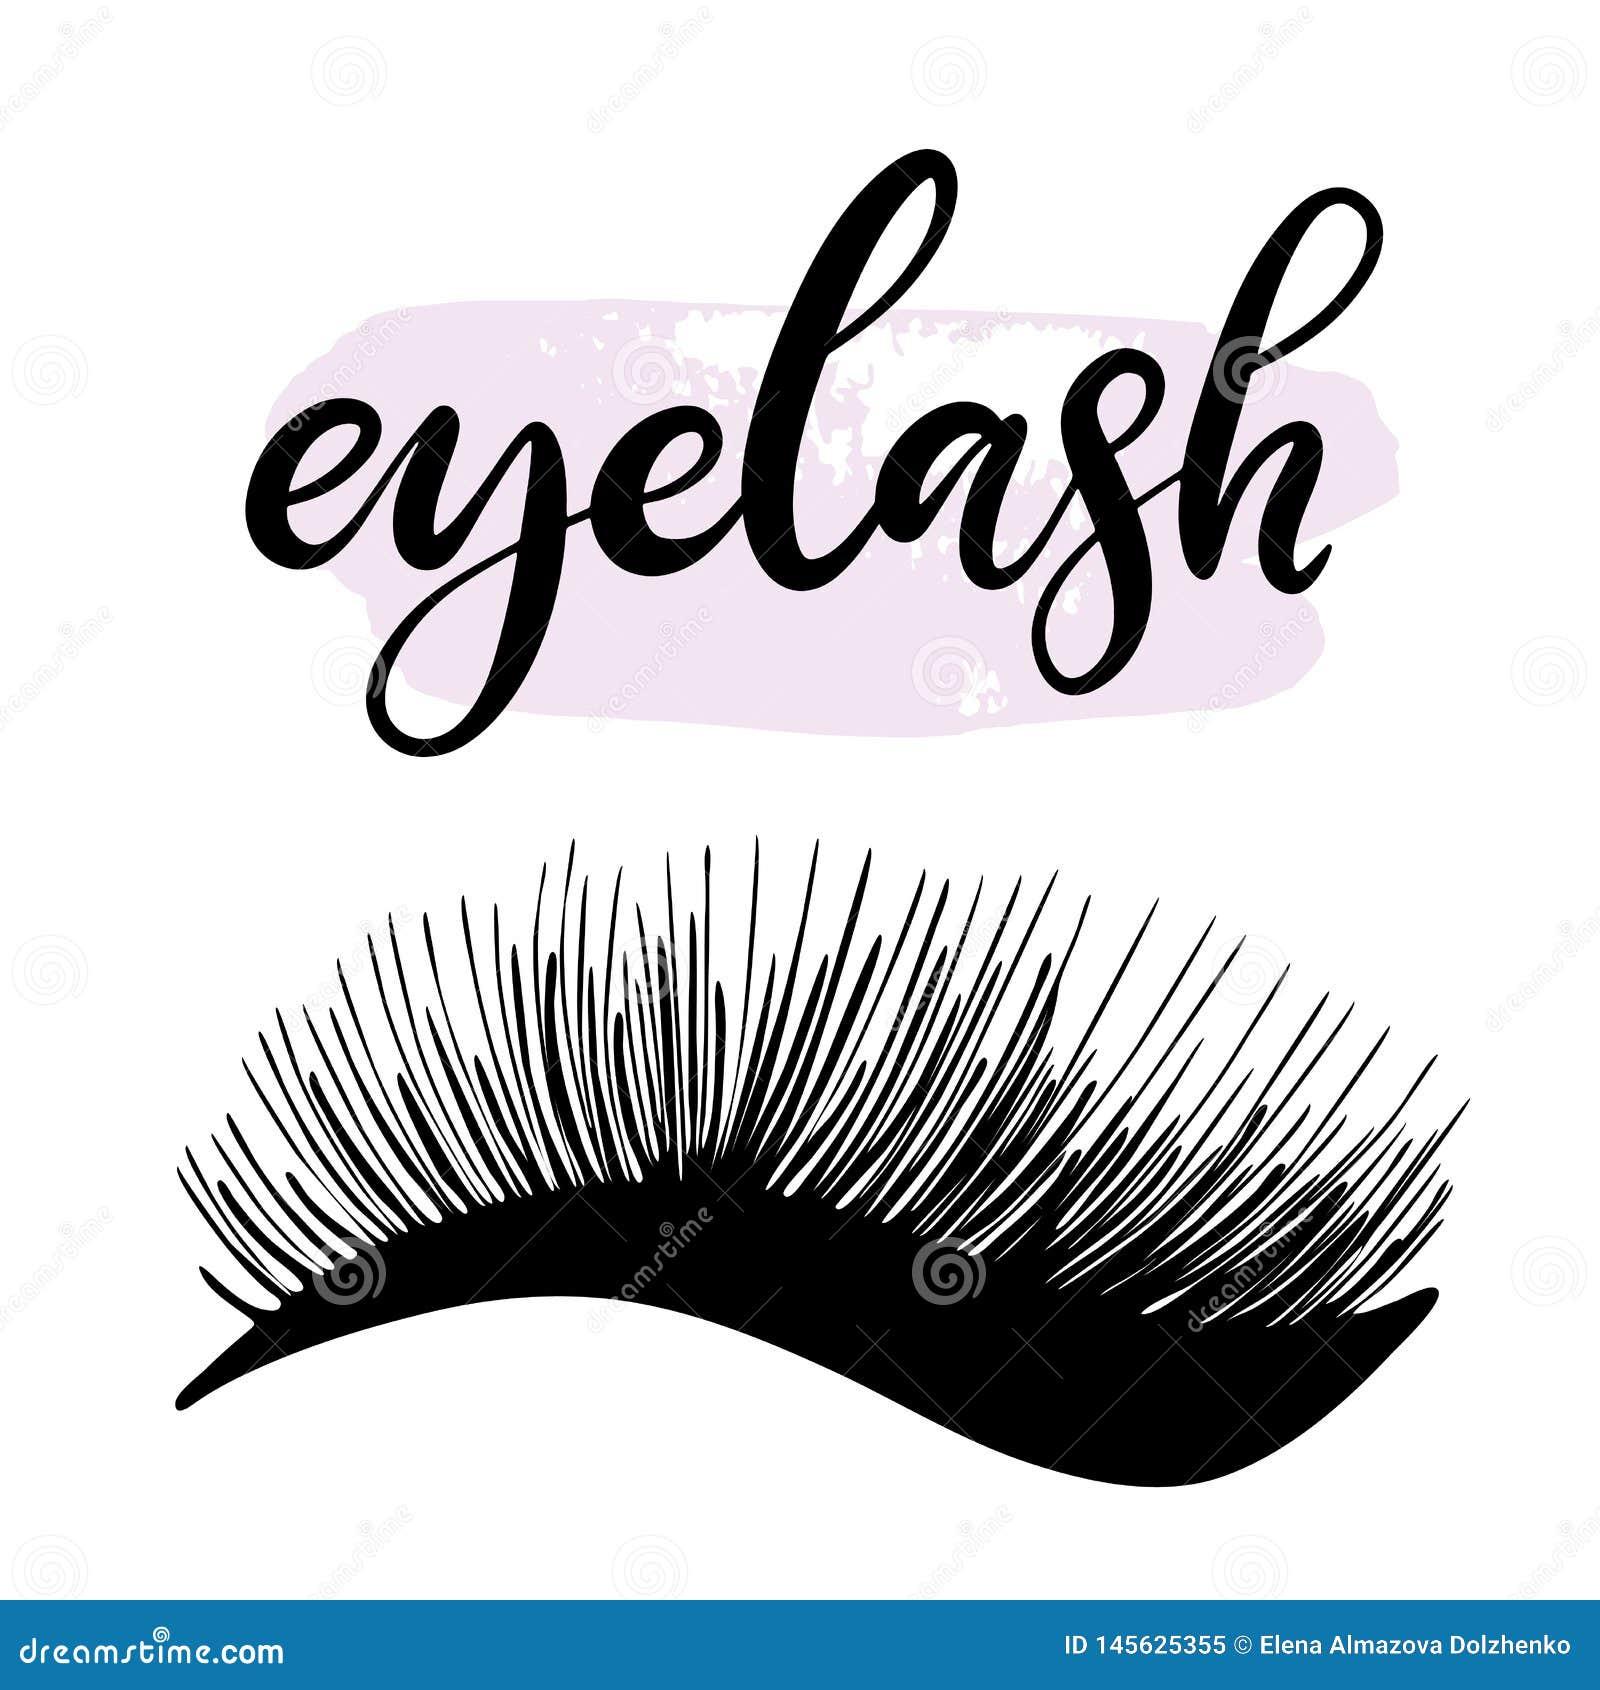 bee935095f0 Lashes lettering vector illustration for beauty salon, fashion blog, logo,  false eyelashes extensions maker, brow master, professional makeup artist.  EPS10